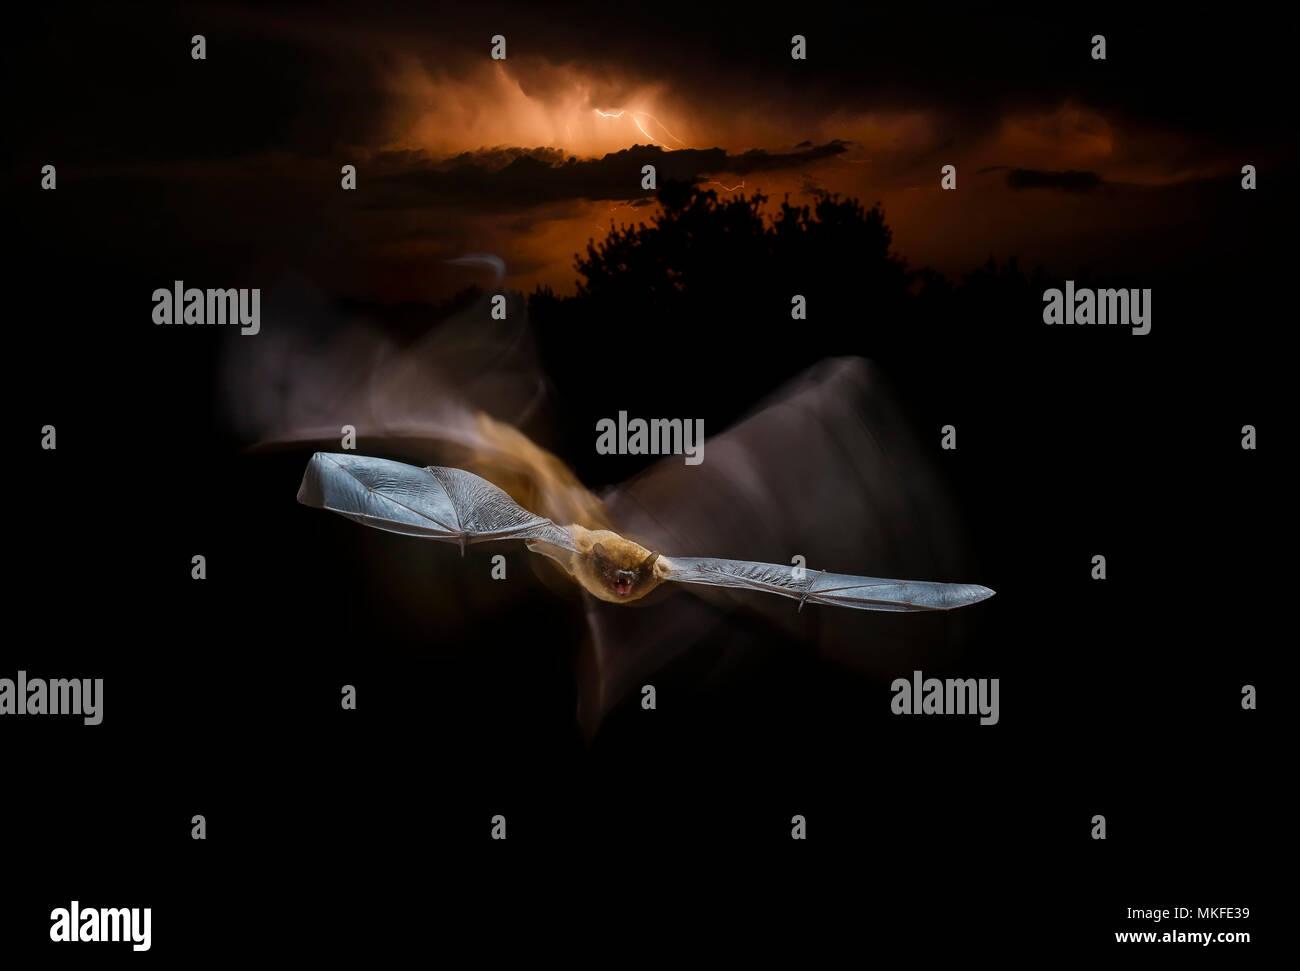 Common pipistrelle (Pipistrellus pipistrellus) in flight and thunderstorm, Salamanca, Castilla y León, Spain - Stock Image